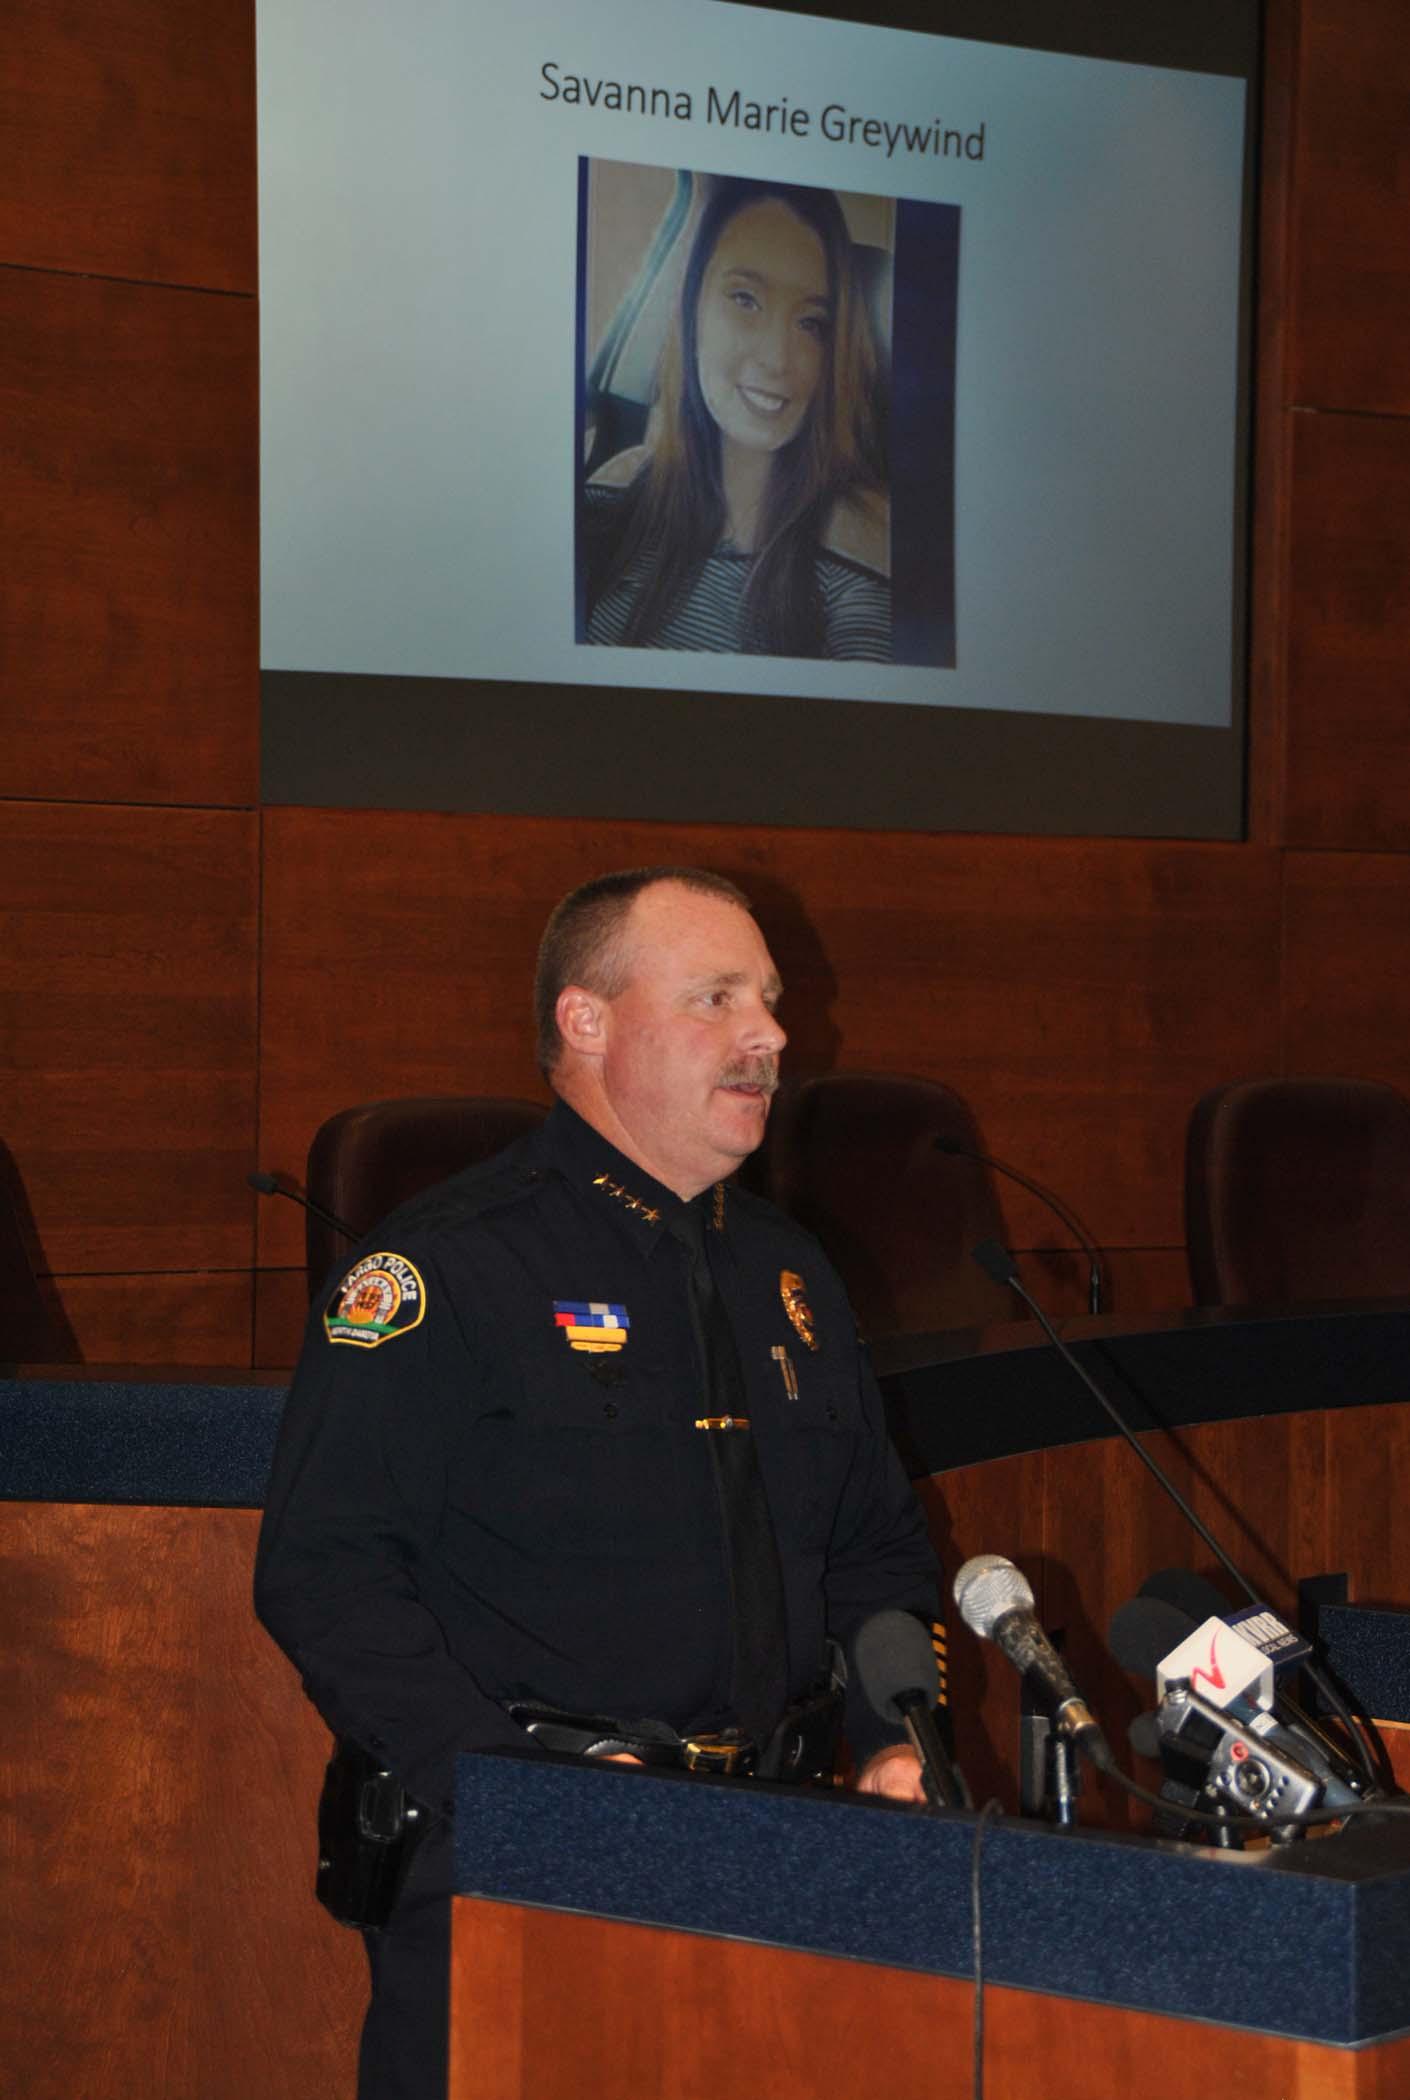 Fargo Police Chief David Todd addresses media Friday - photo by C.S. Hagen